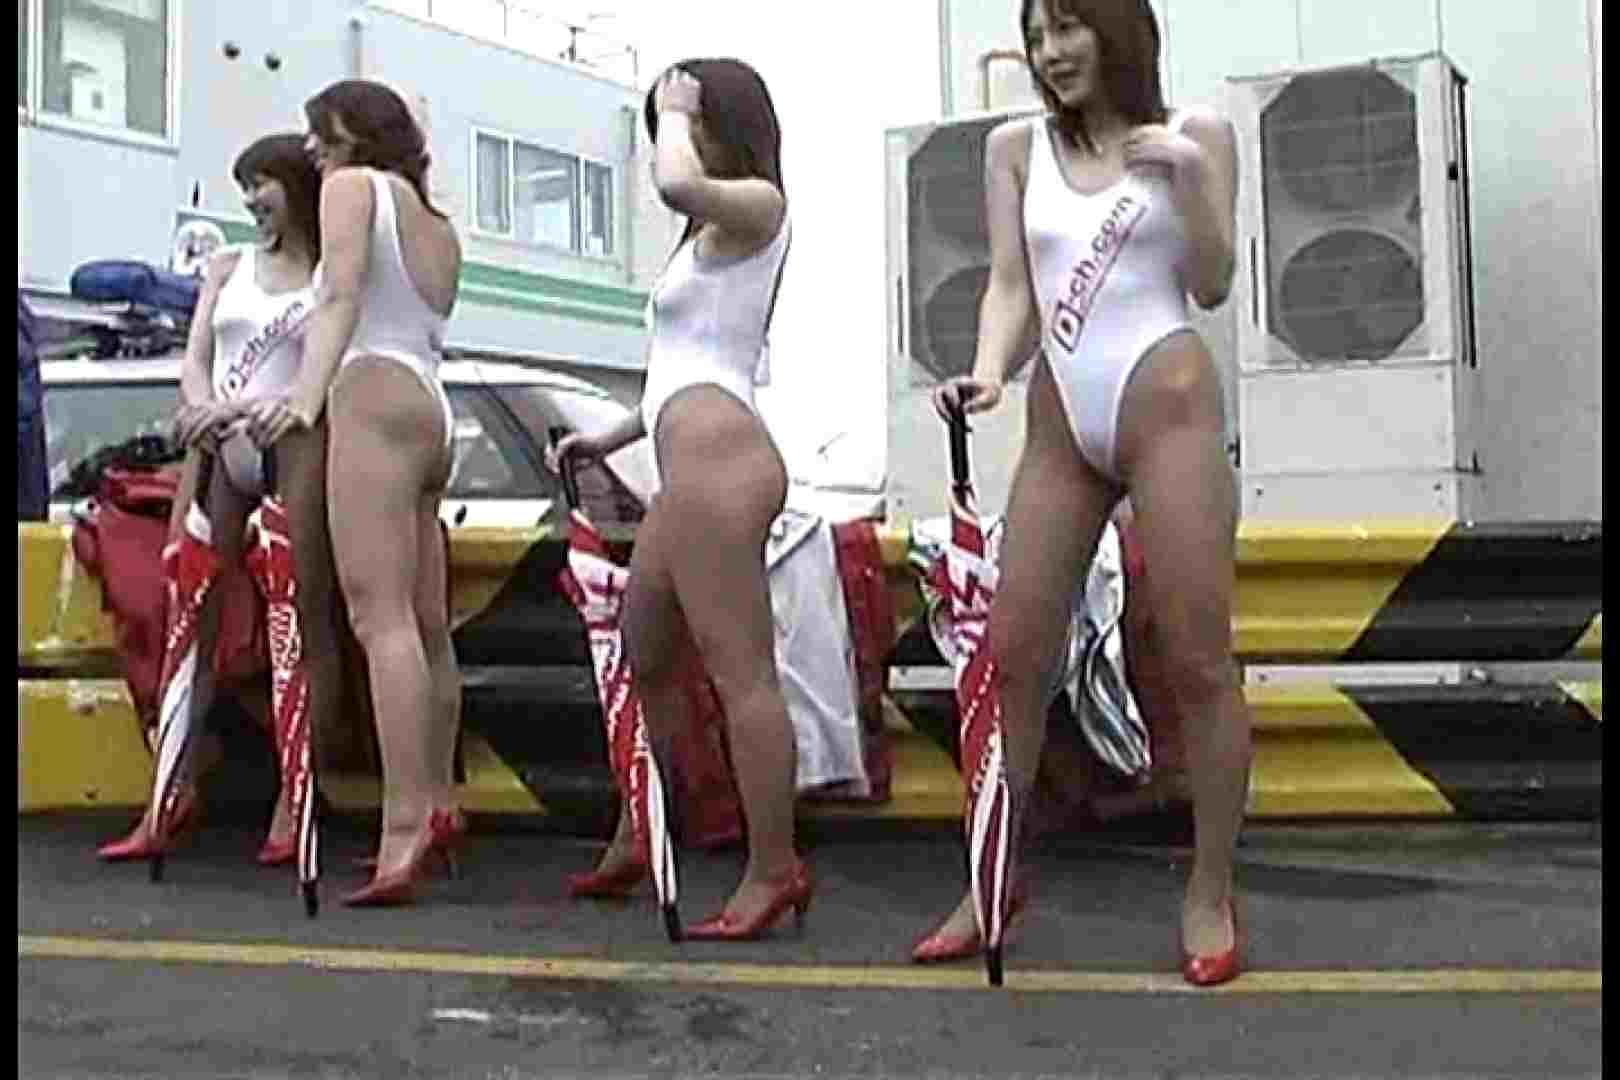 RQカメラ地獄Vol.4 マンコ | レースクイーン  53pic 16